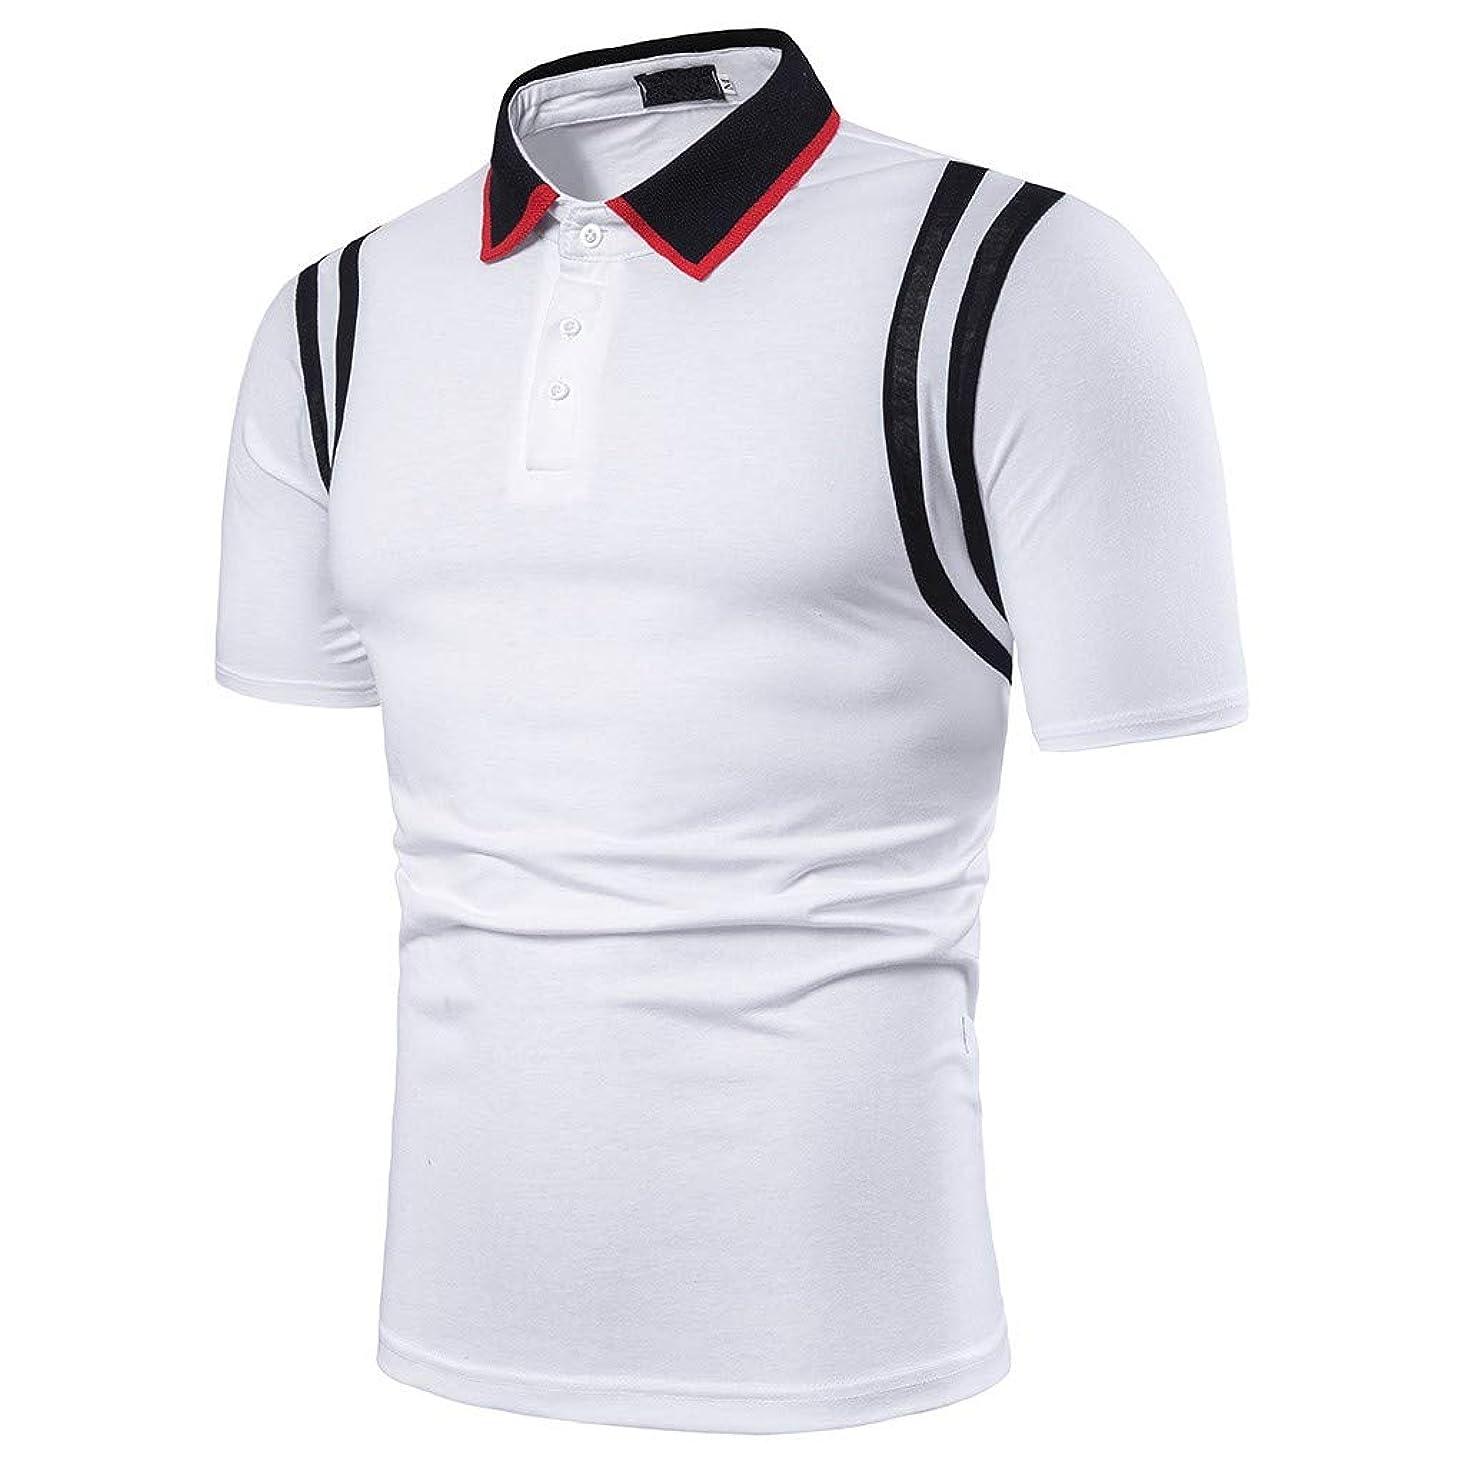 Men's Athletic Golf Polo Shirts,MmNote Bodybuilding Body Shaper Sweat-Wicking Technology Lightweight Short Sleeve